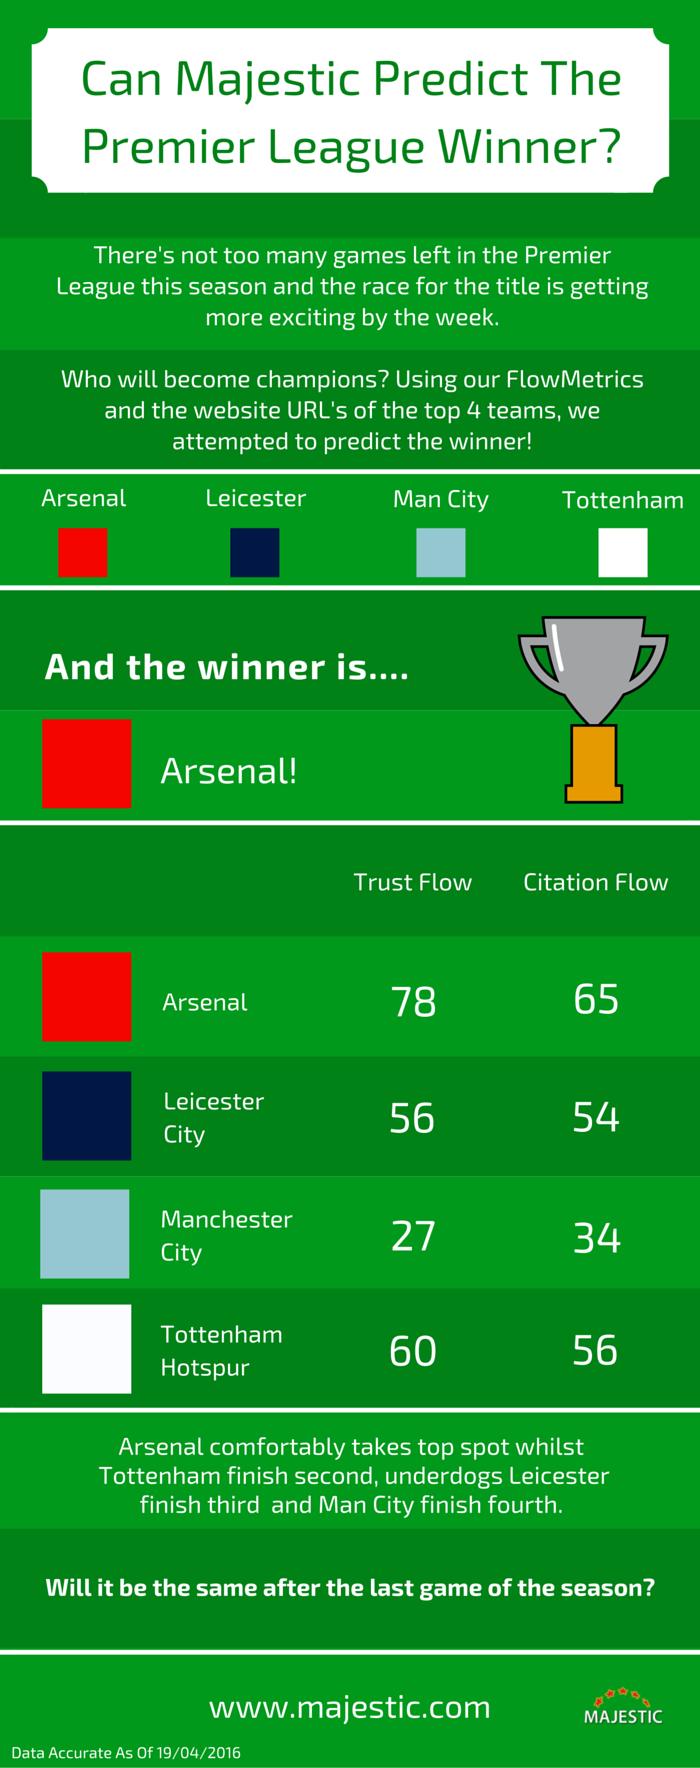 Can Majestic Predict The Premier League Winner